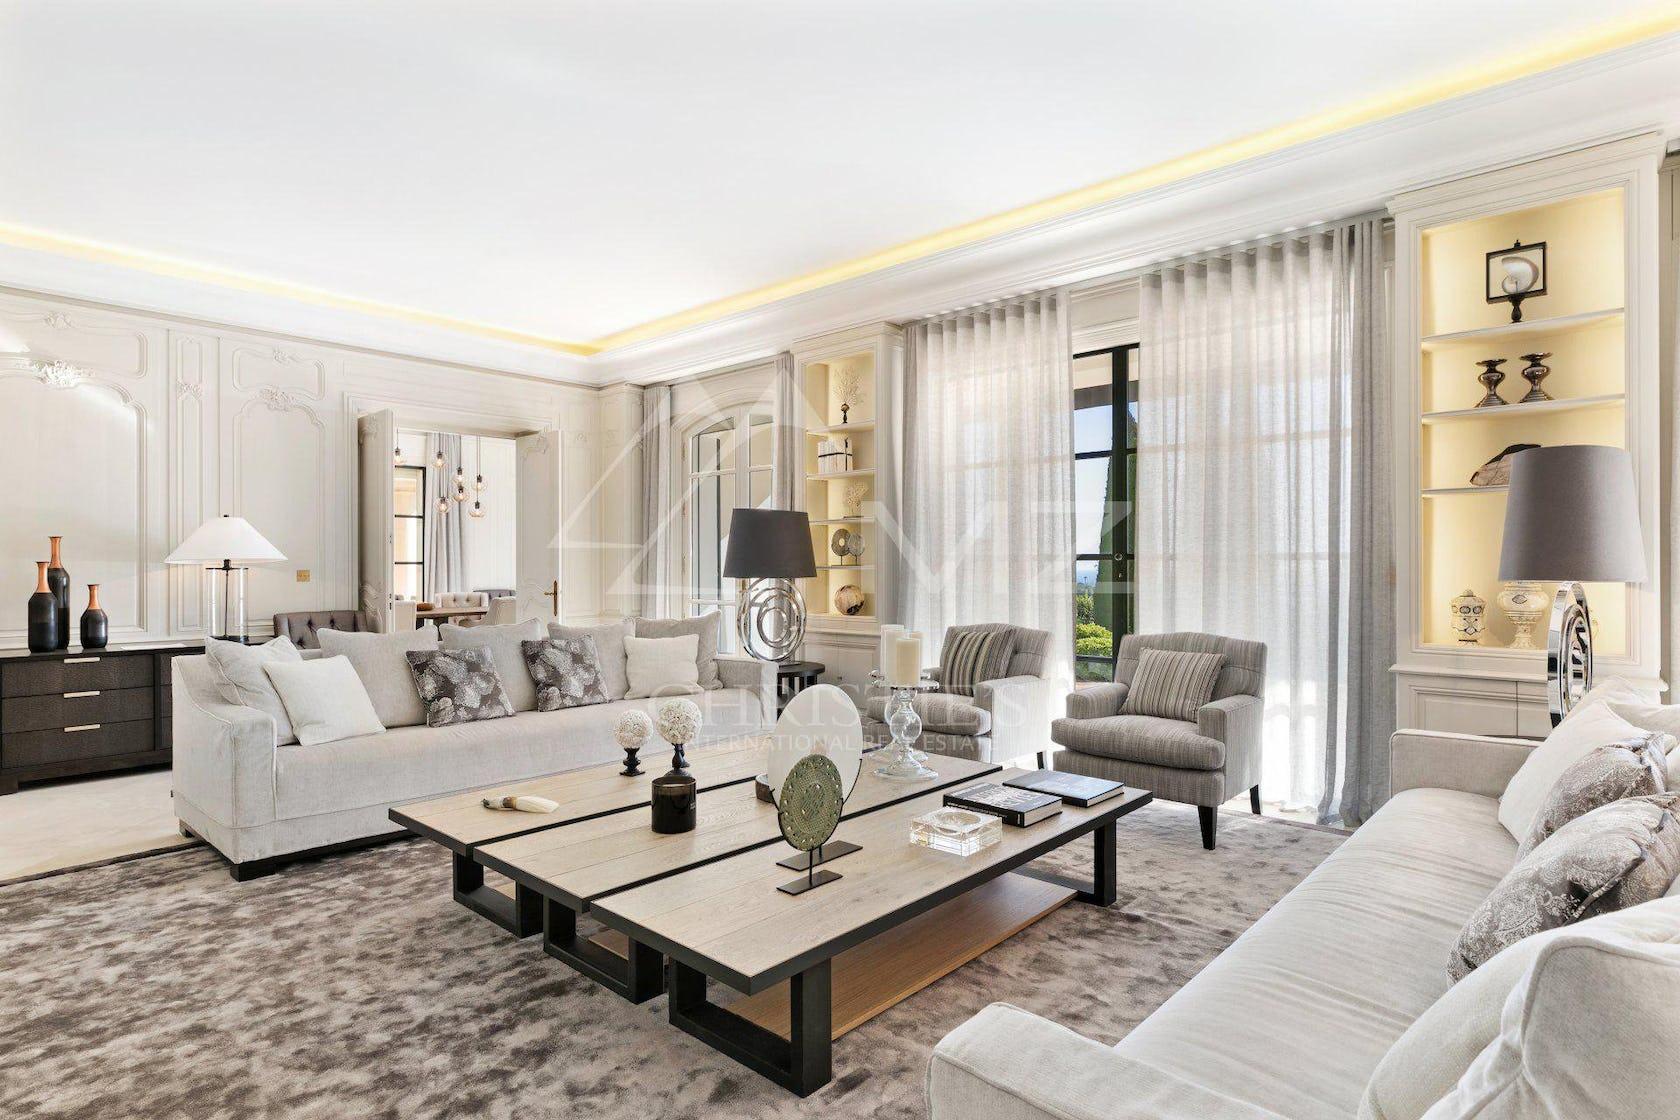 furniture living room room indoors table coffee table interior design rug